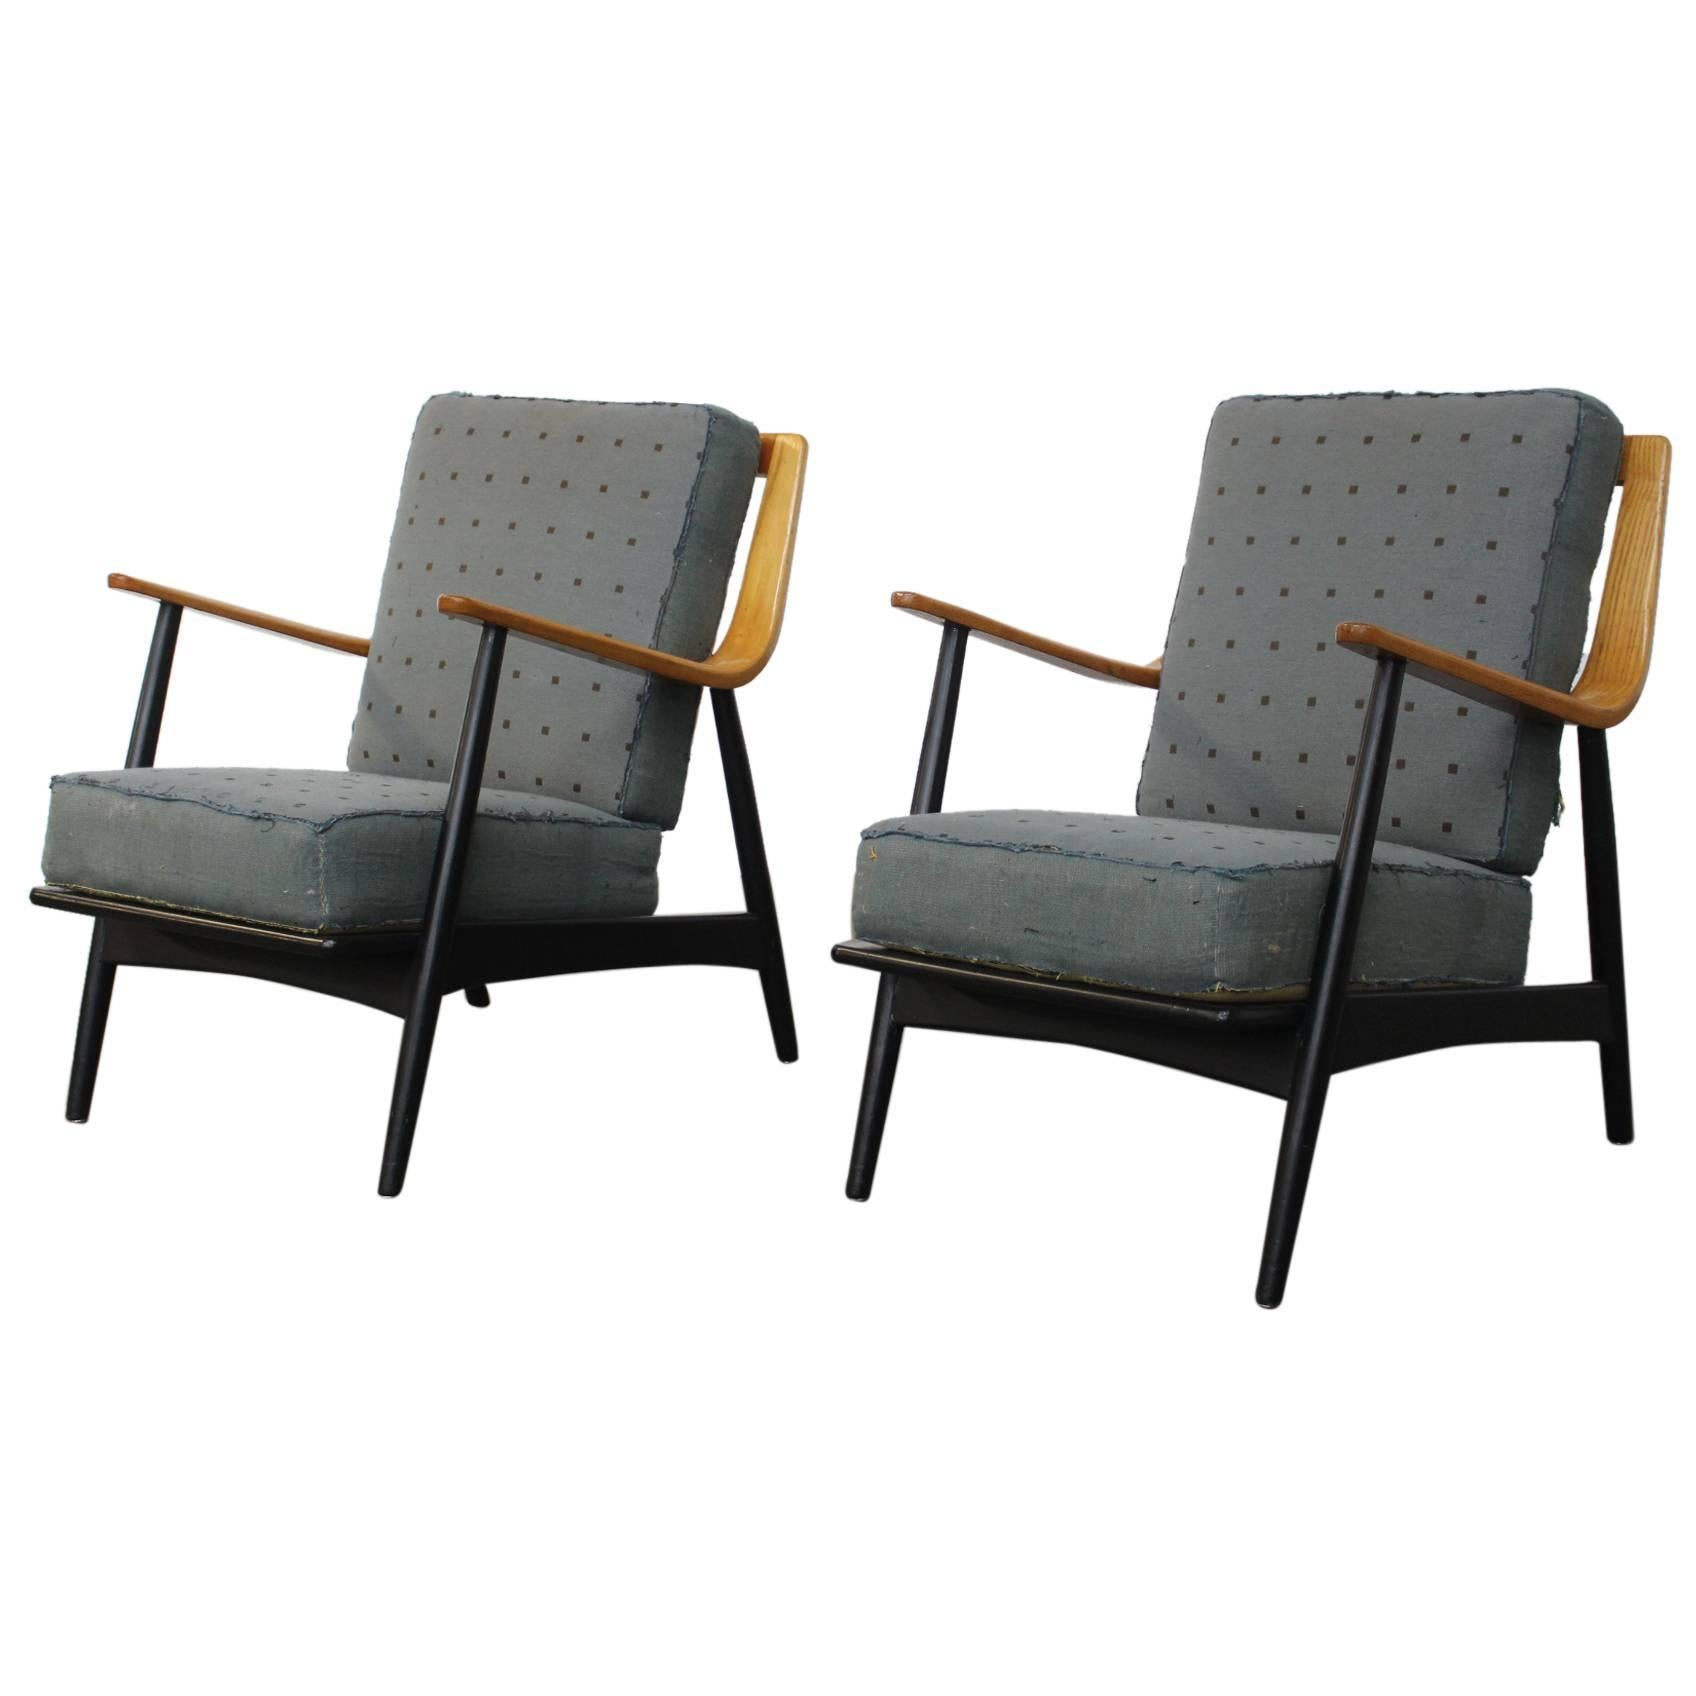 Pair of Easy Chairs, Peter Hvidt and Orla Mølgaard-Nielsen